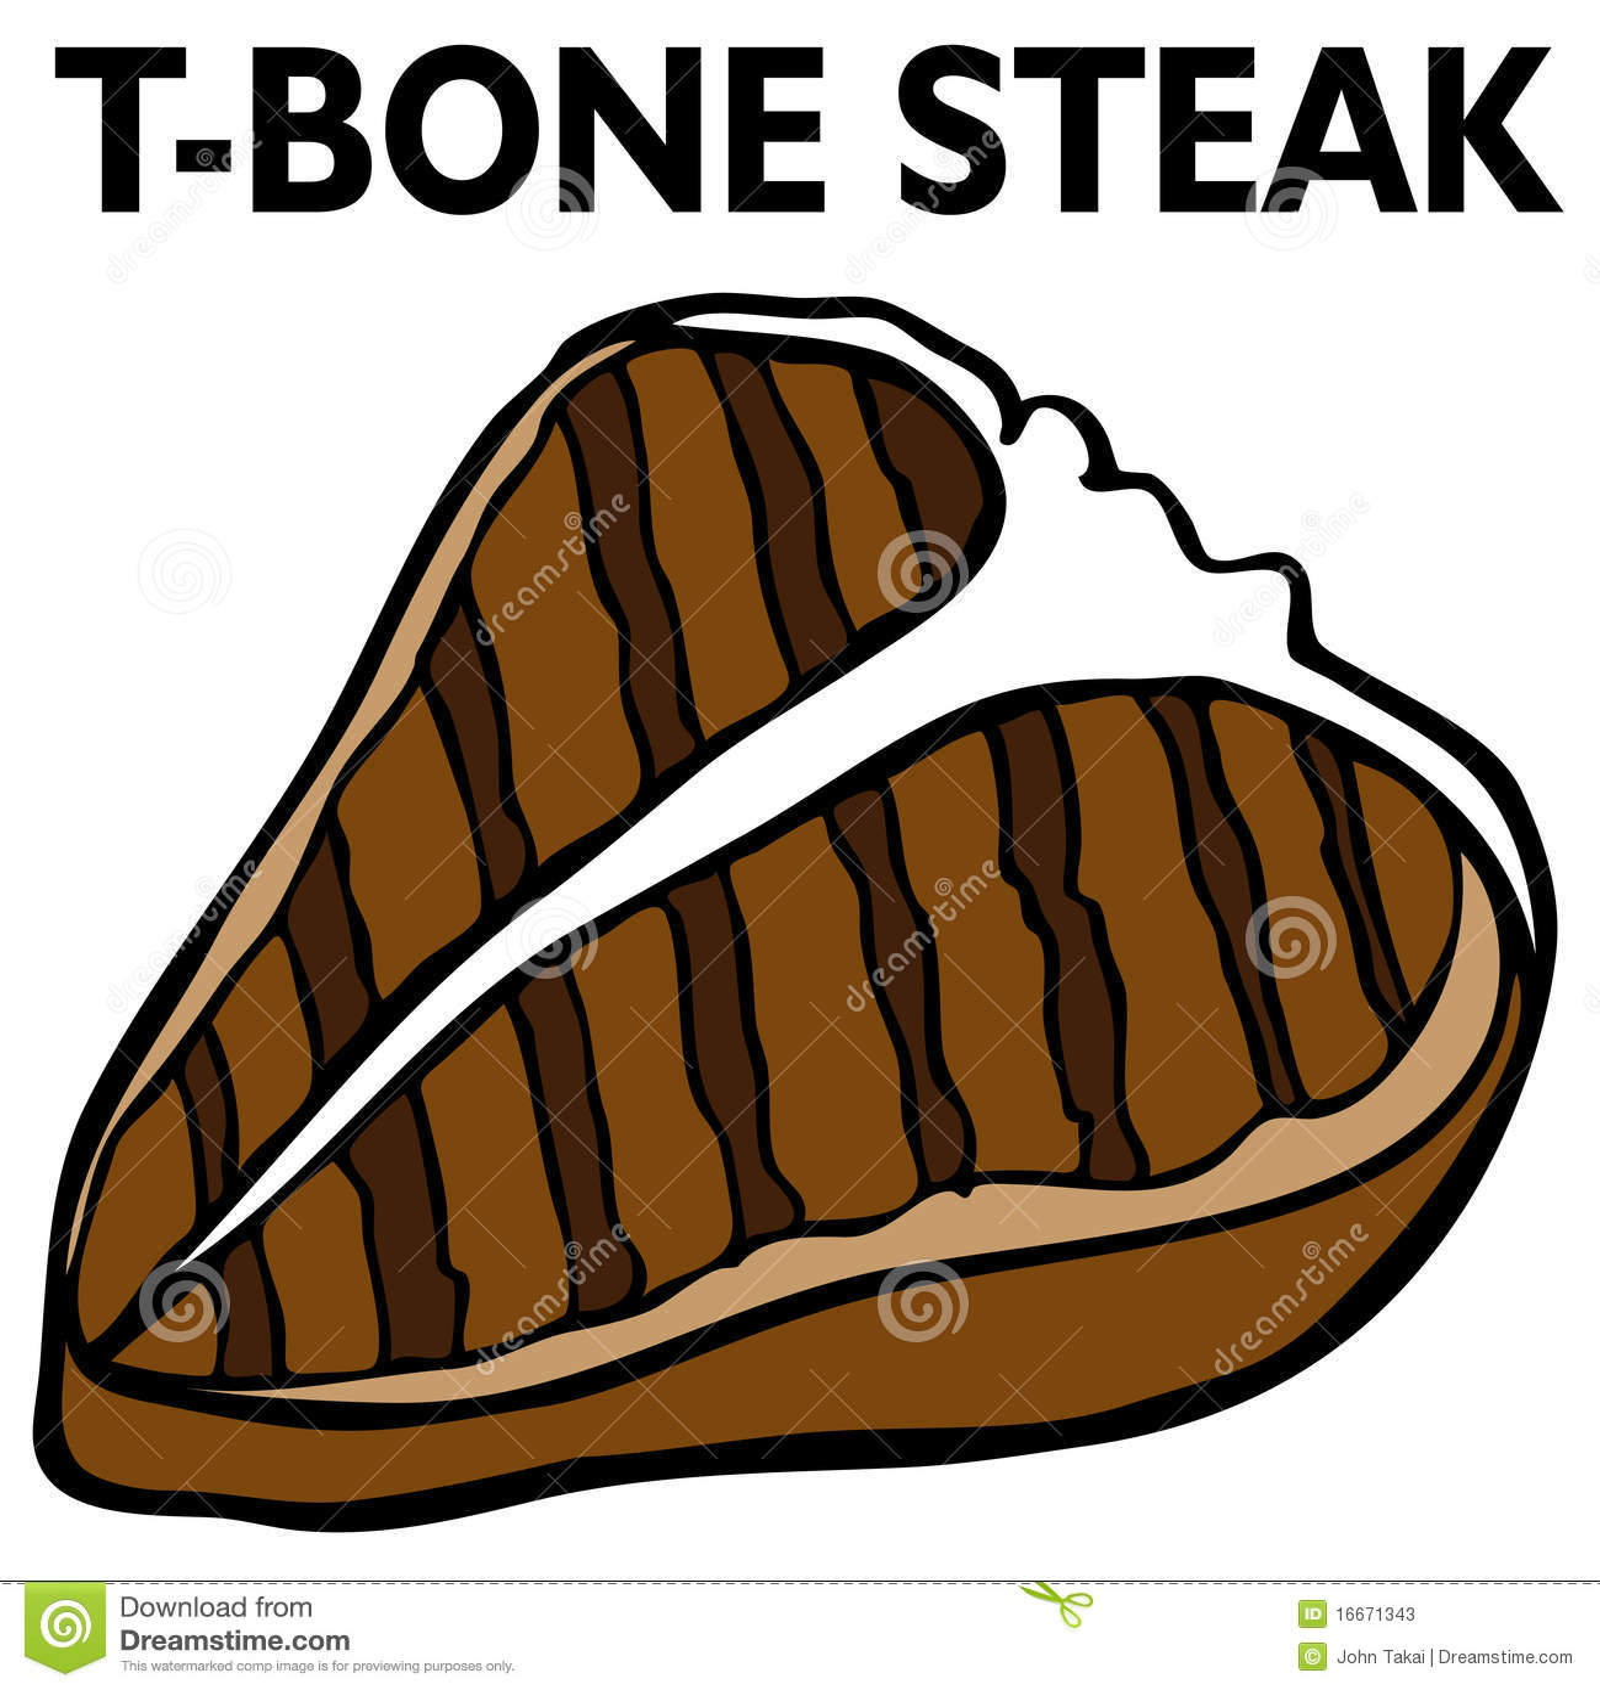 Tbone Cartoons and Comics  CartoonStock  Cartoon Humor